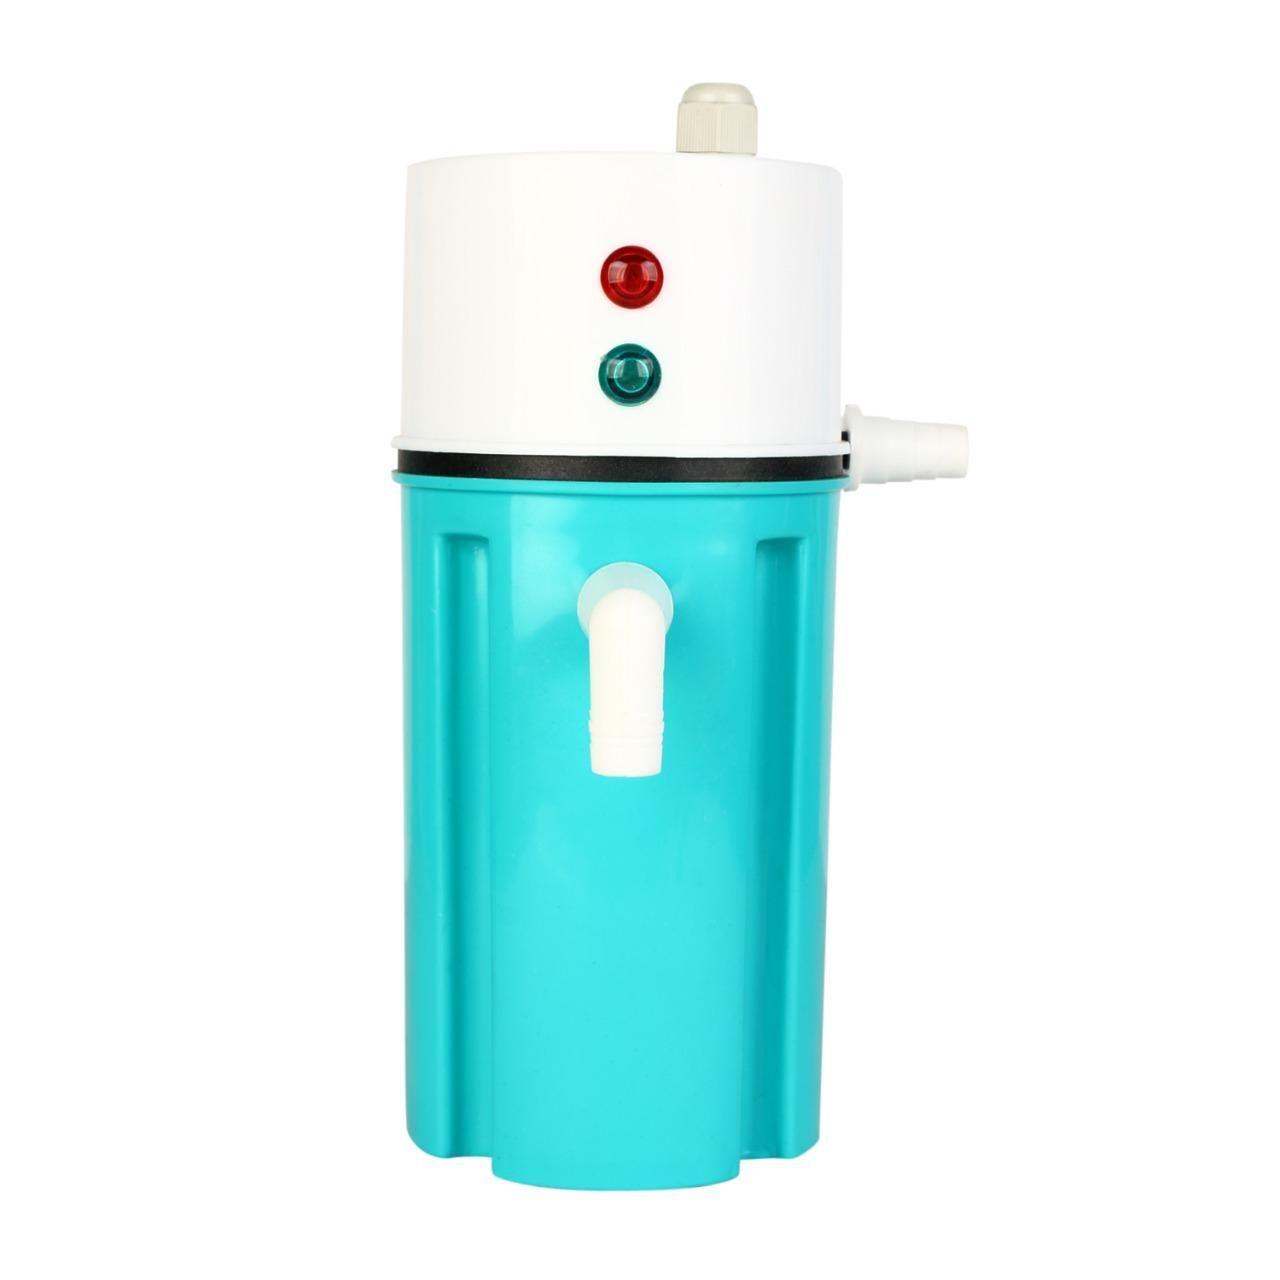 Geyser- Instant Portable Water Heater Geysers